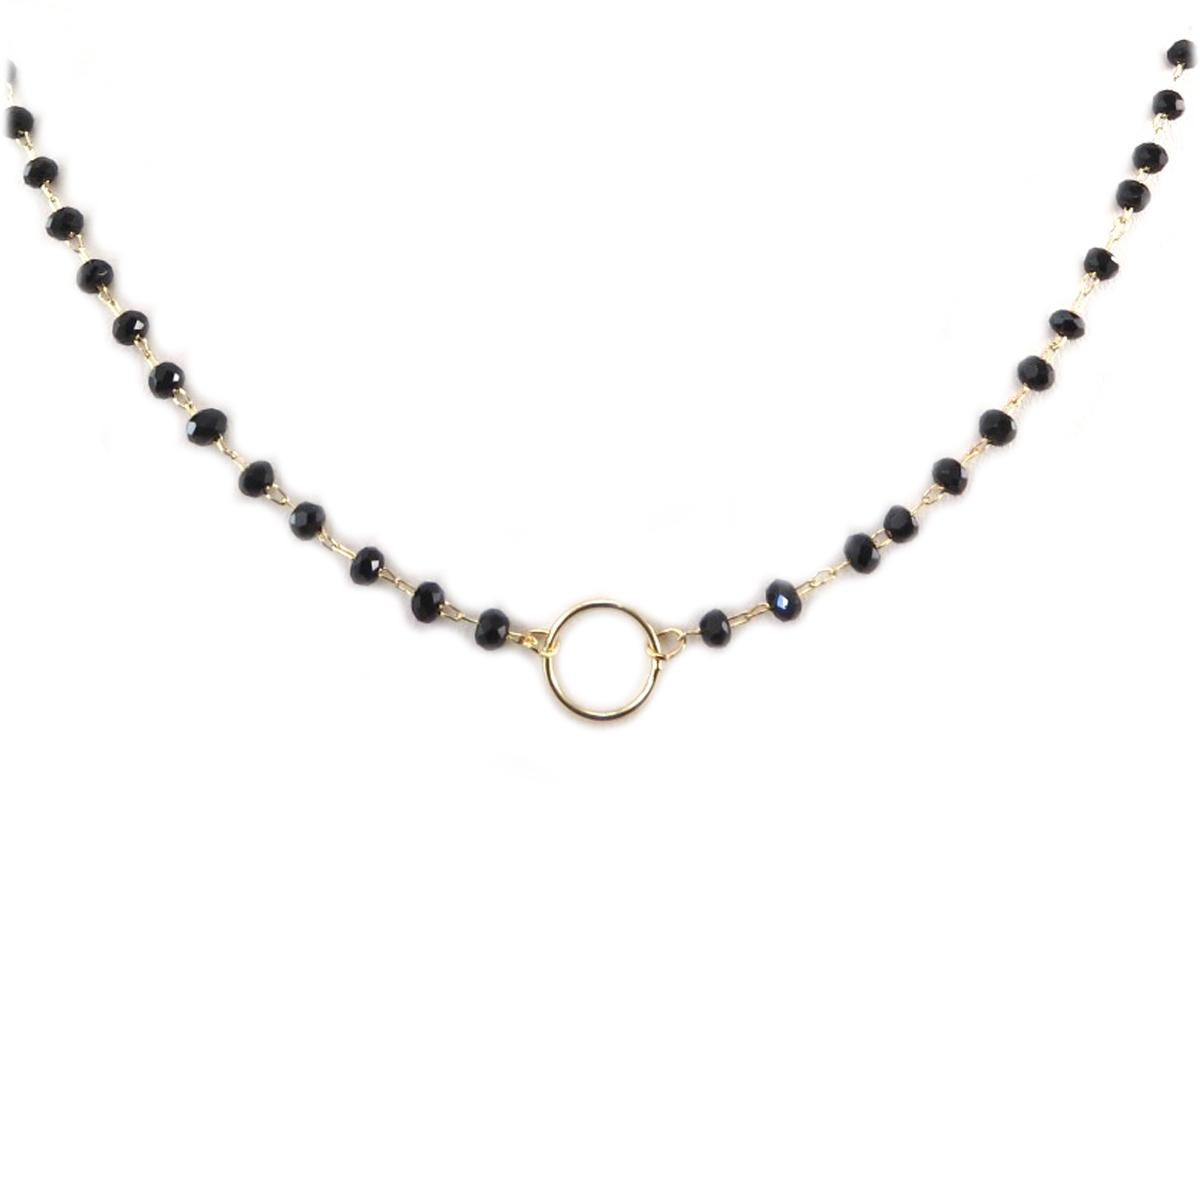 Collier artisanal \'Boho\' noir doré - 9 mm - [Q6195]